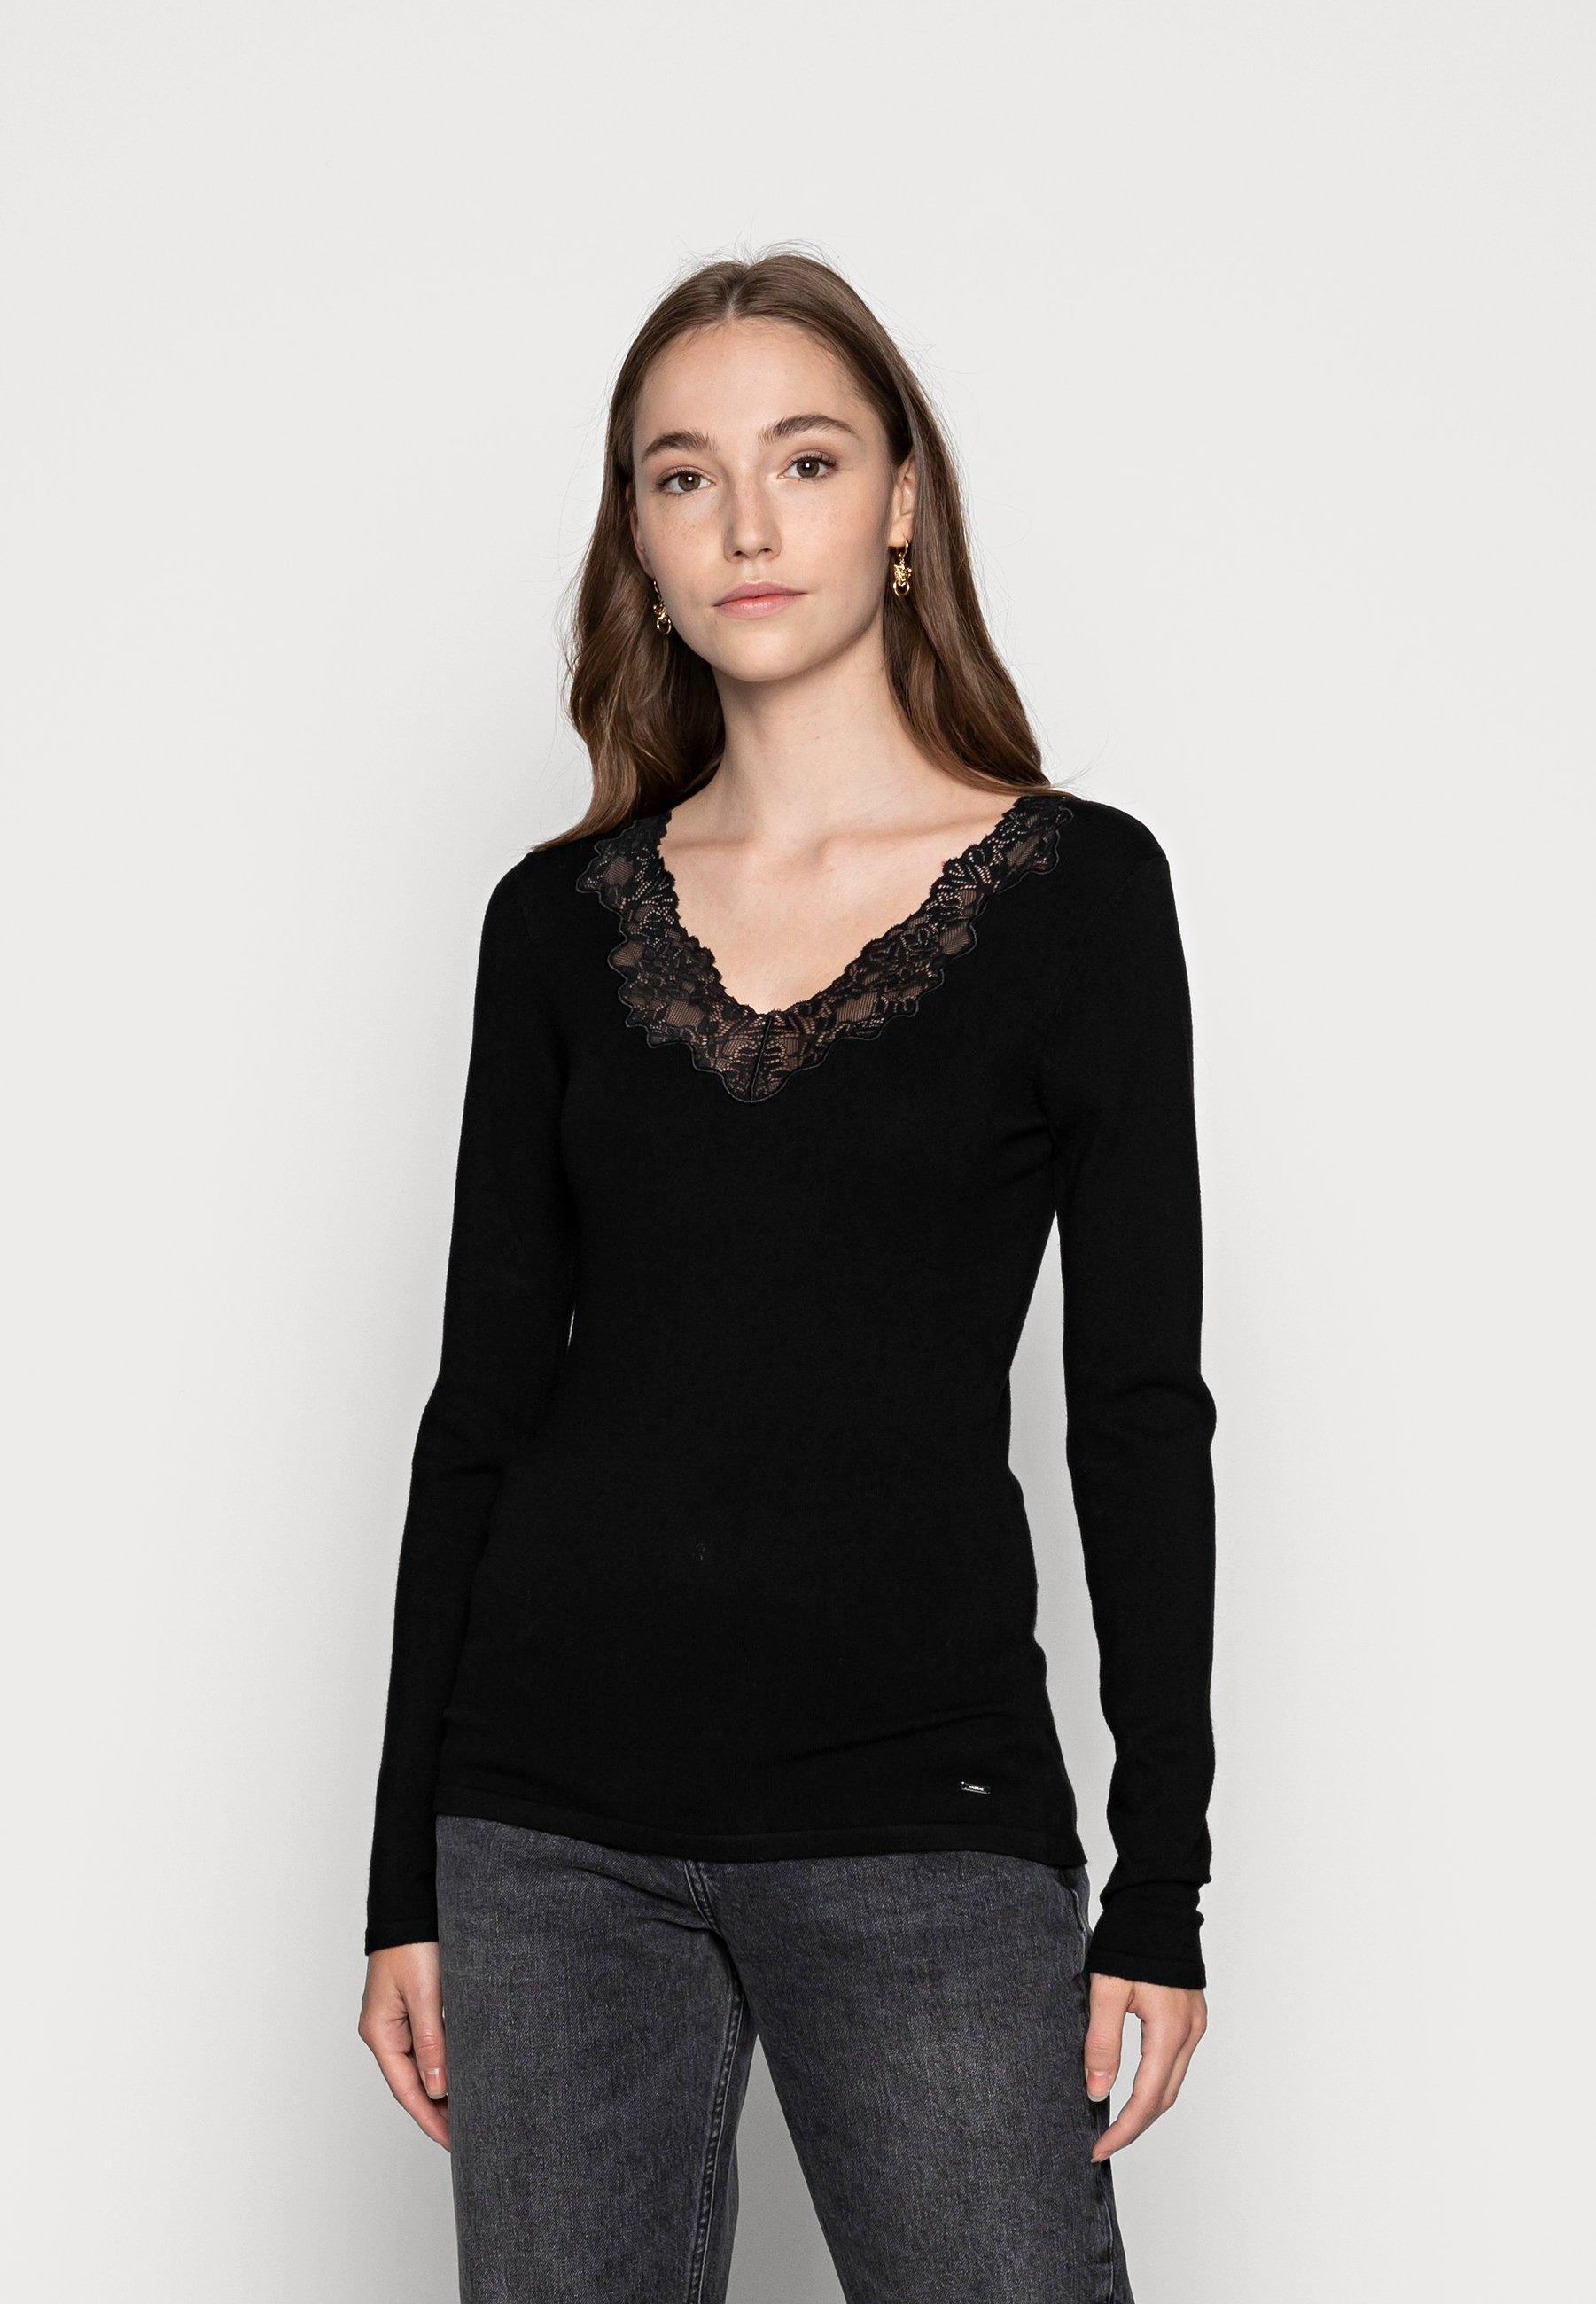 Femme MBIBI.N JERSEY - T-shirt à manches longues